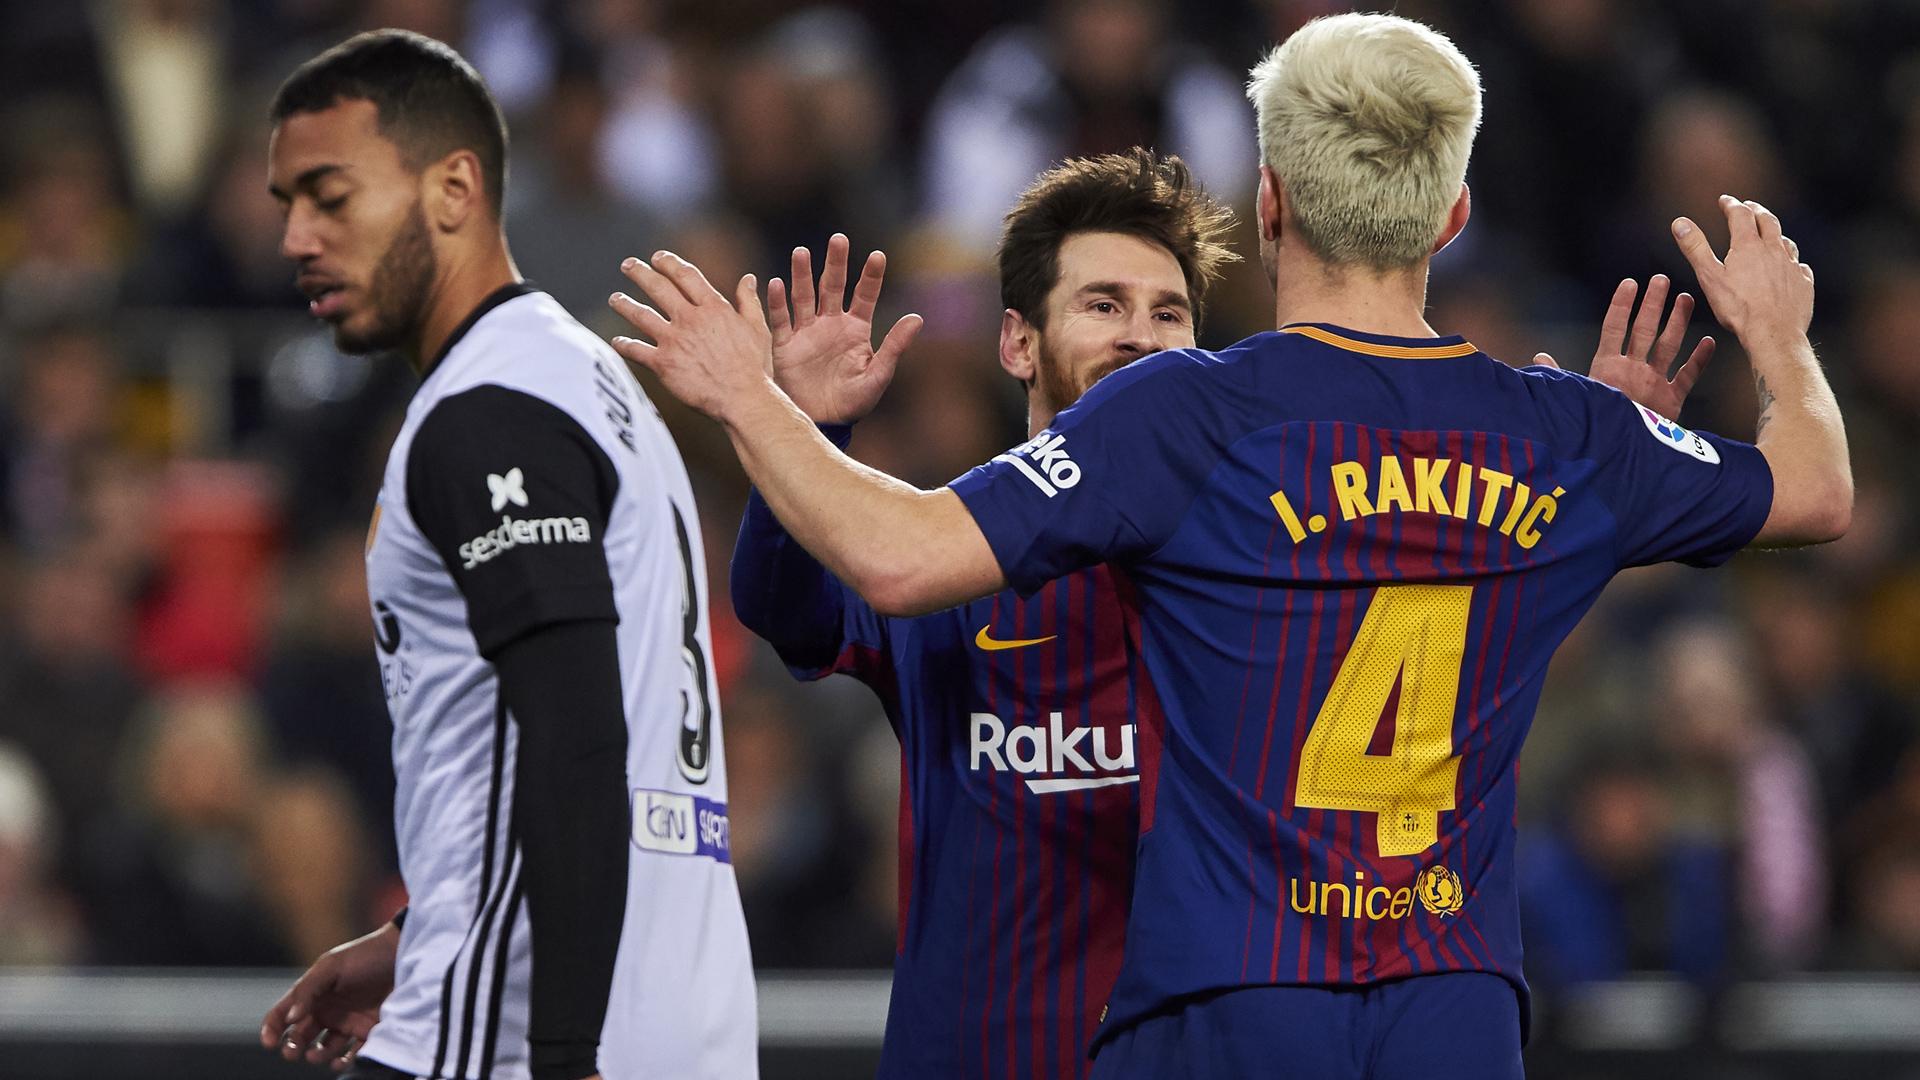 FC Barcelona Messi Rakitic 08022018 6919063634e